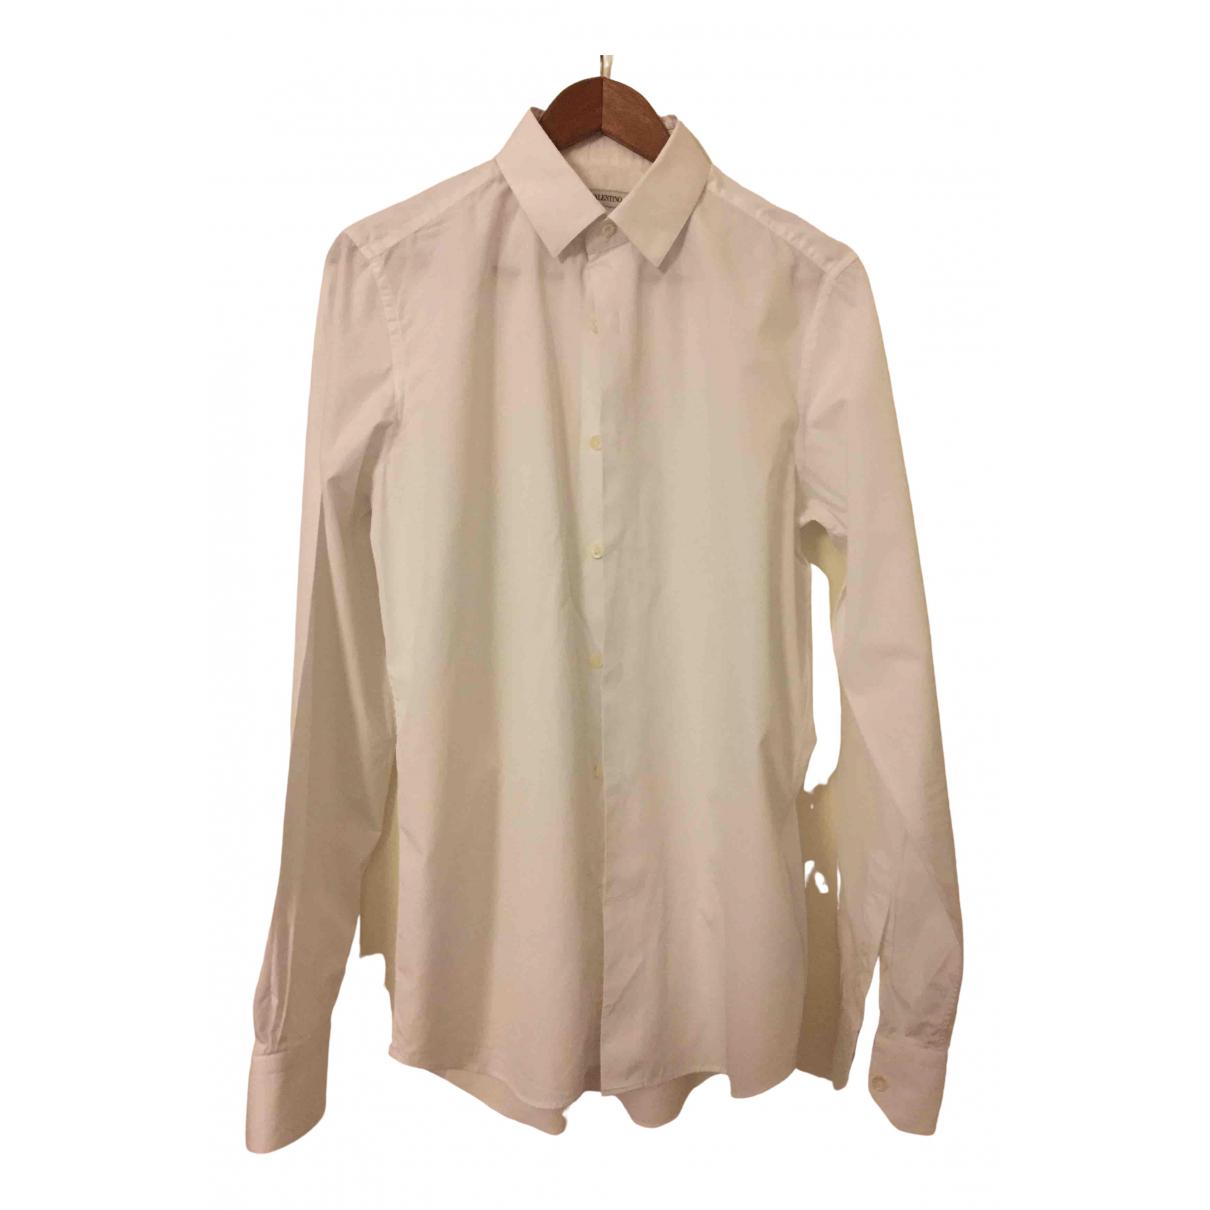 Valentino Garavani \N White Cotton Shirts for Men 39 EU (tour de cou / collar)